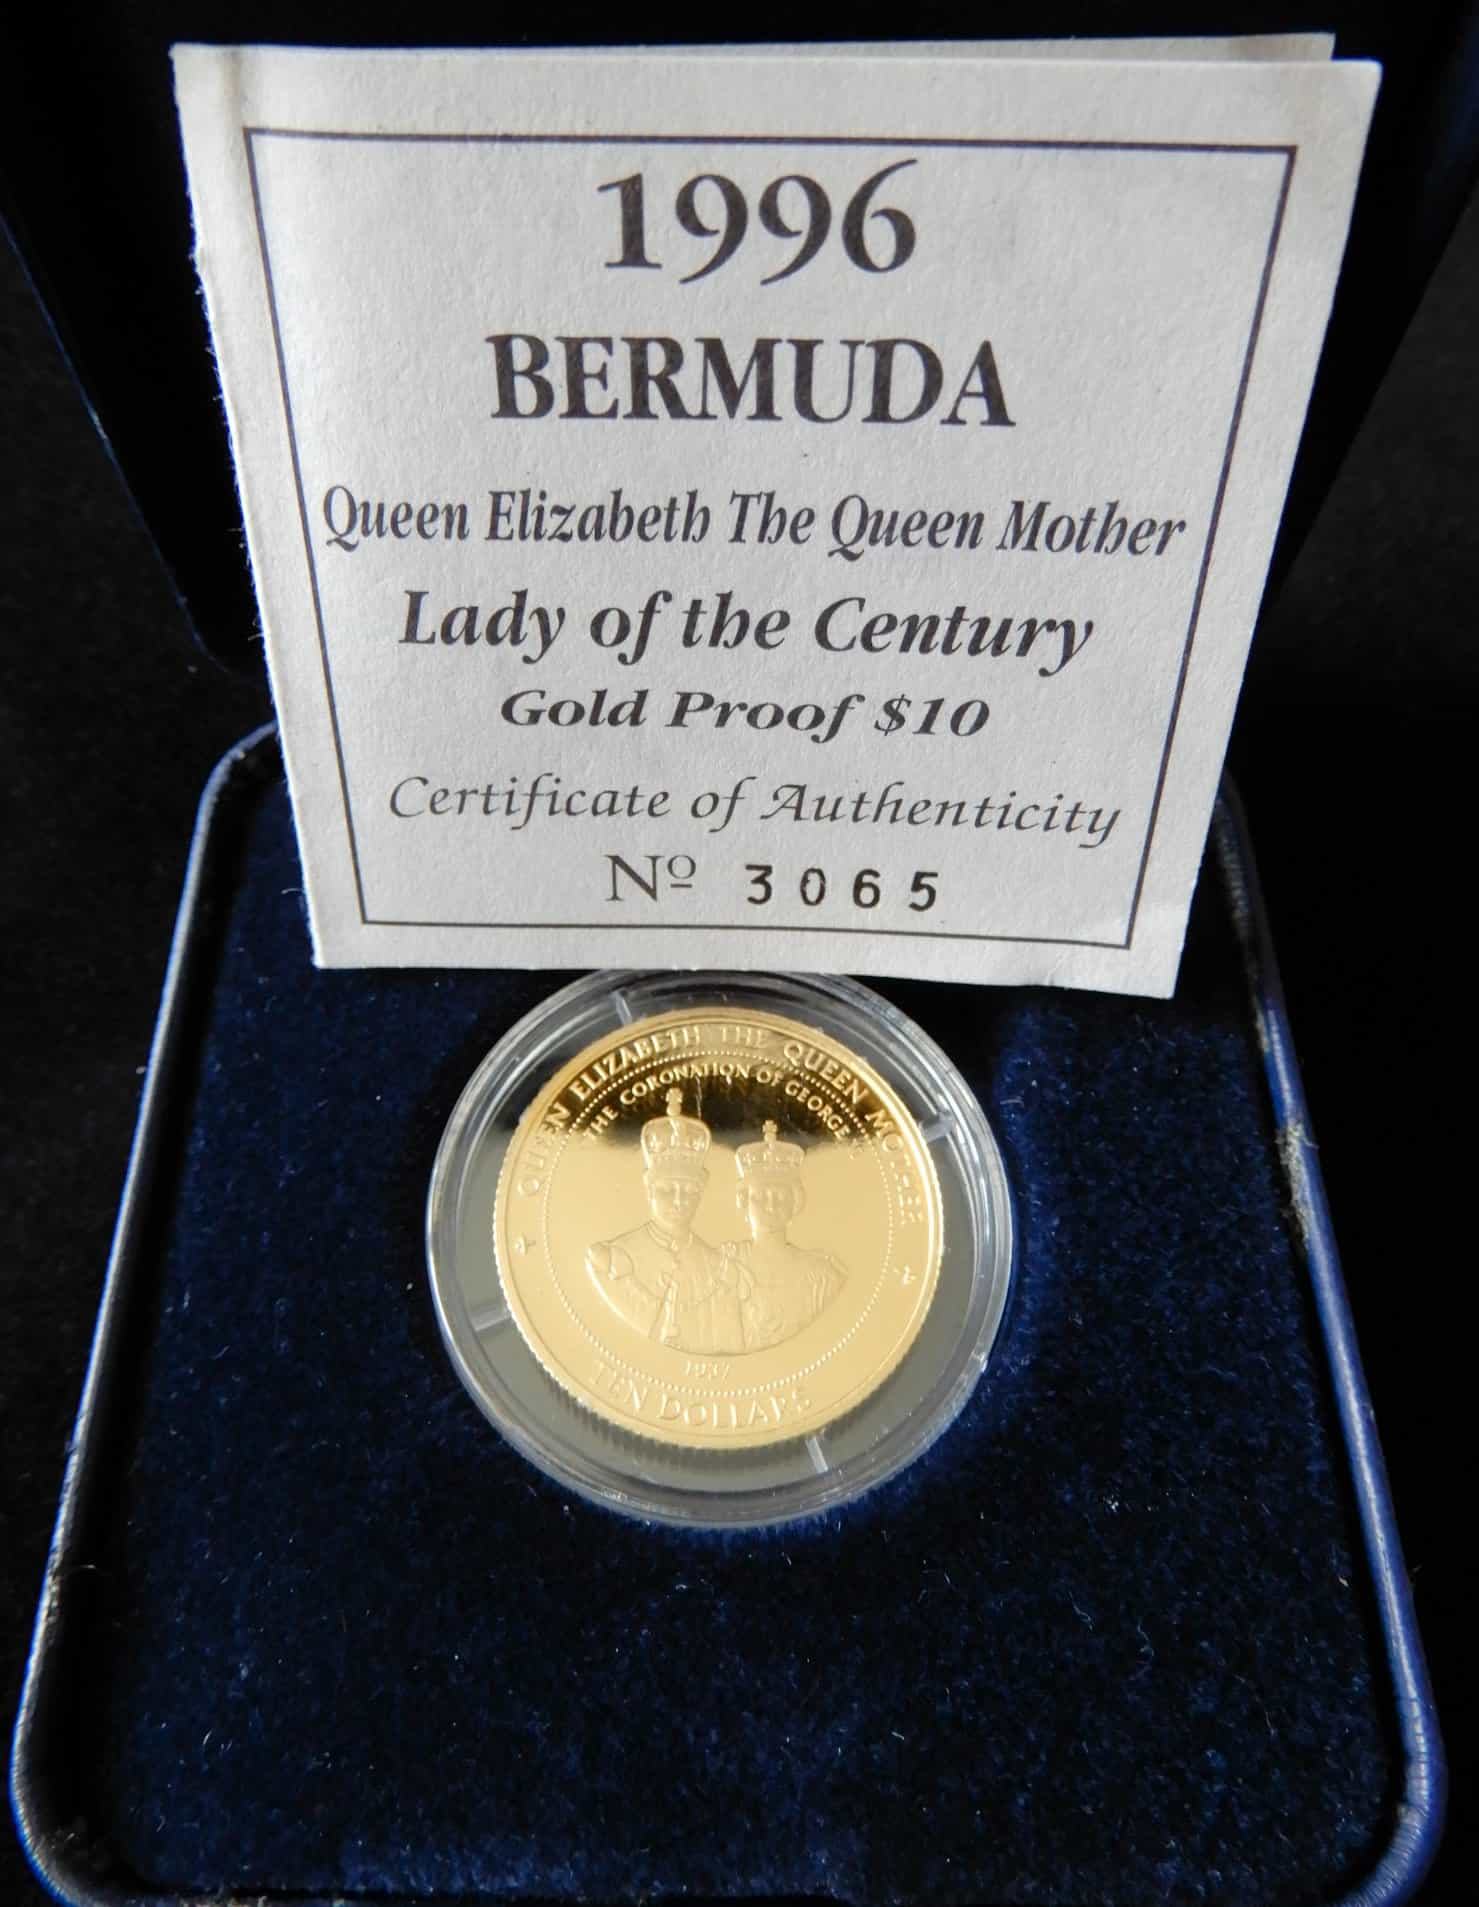 2000 Ireland Millennium 1 Pound Silver Proof Coin w// Box and COA